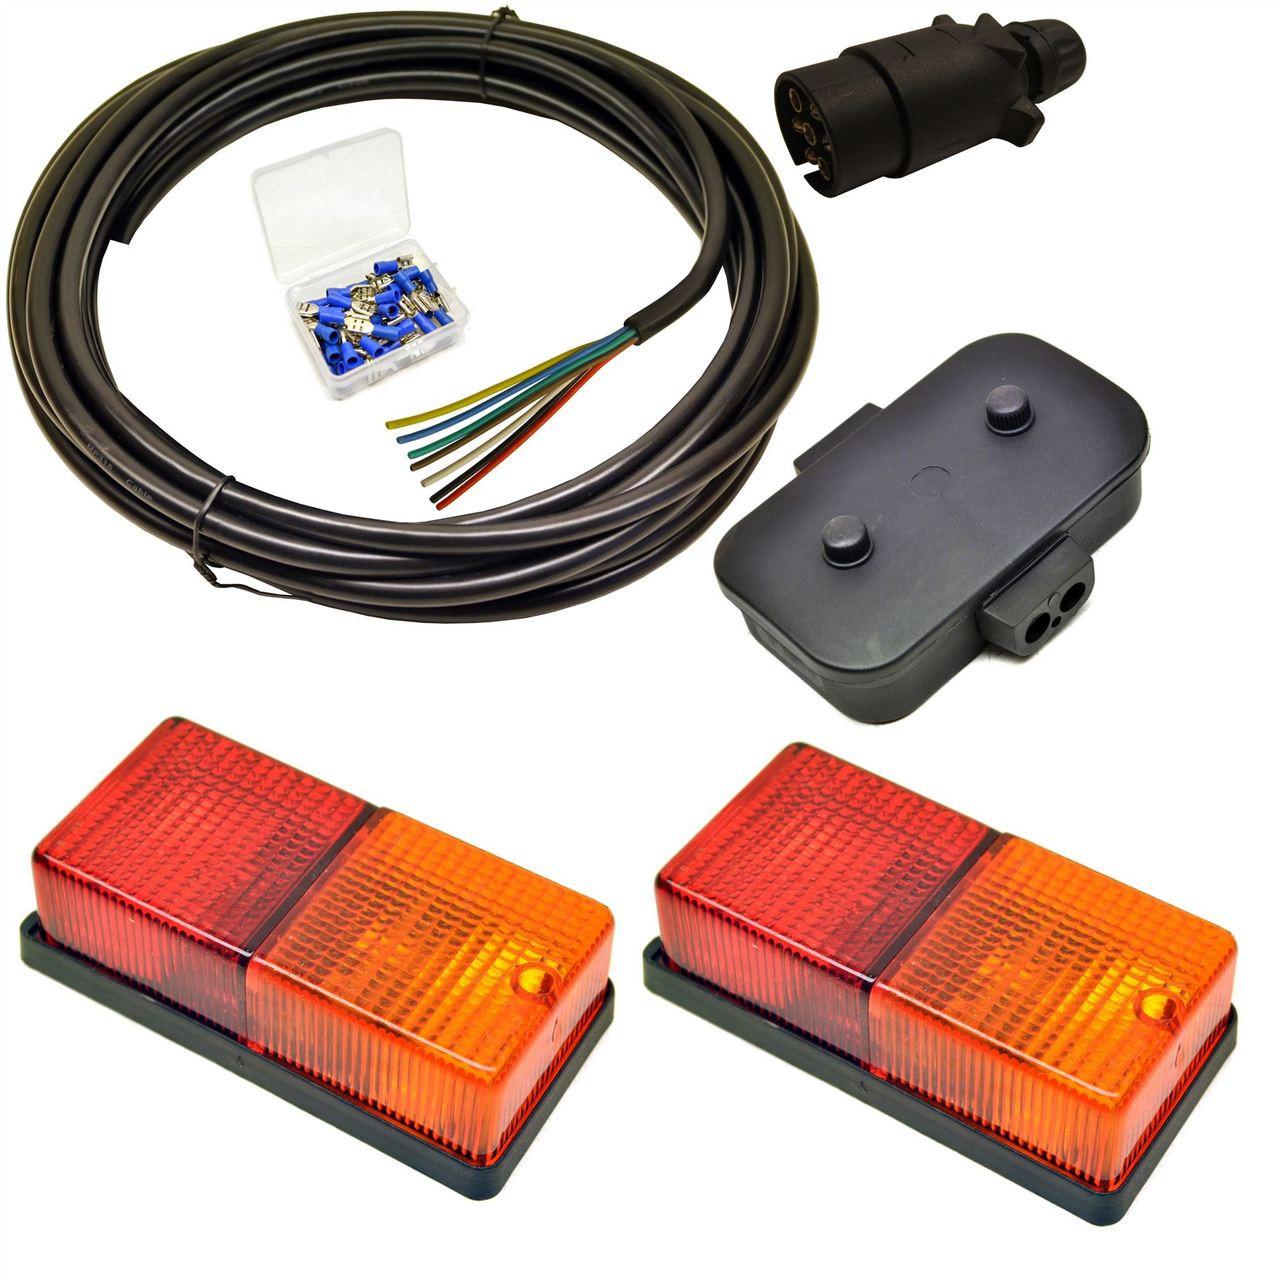 Trailer Light Wiring Kit Medium Lights, Plug, Junction Box, 5m Wire ...